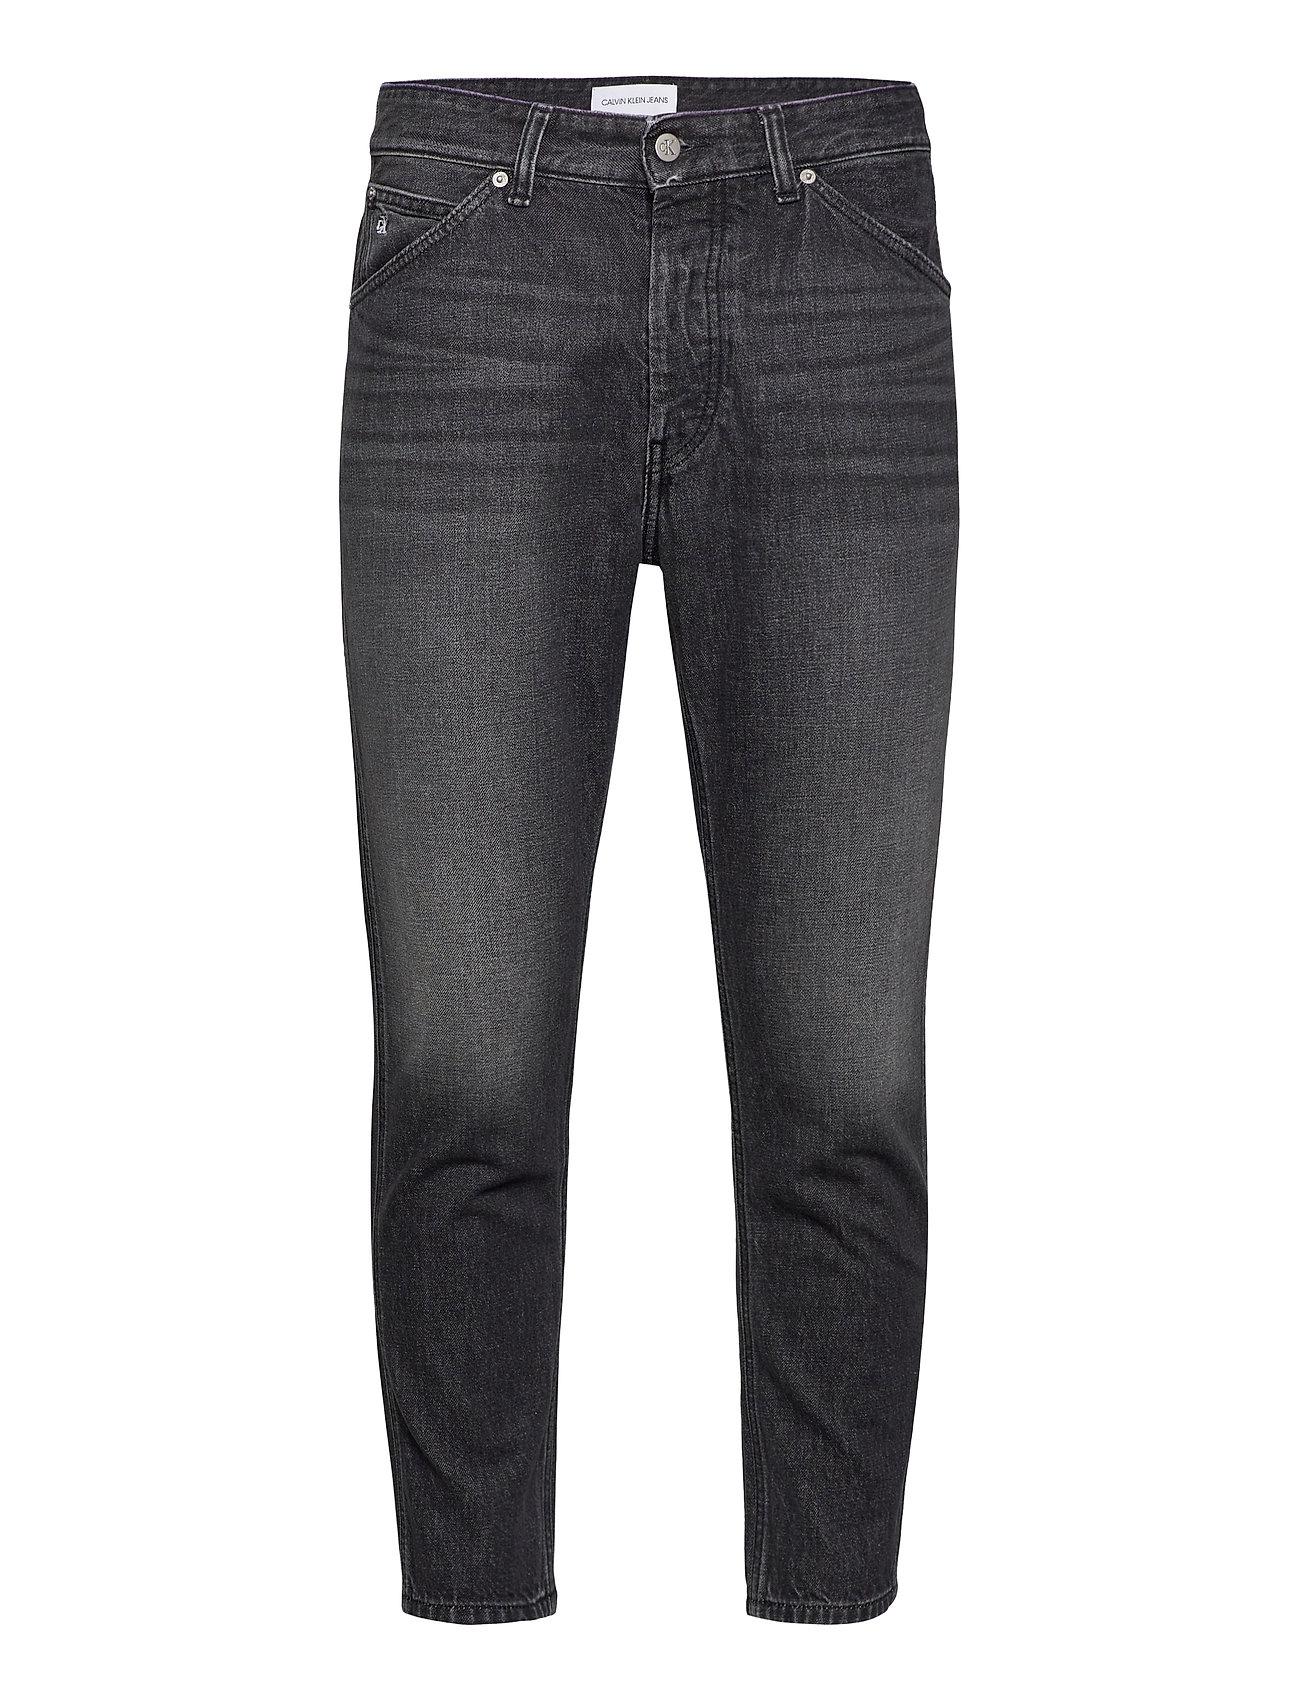 Image of Dad Jean Jeans Sort Calvin Klein Jeans (3456629295)